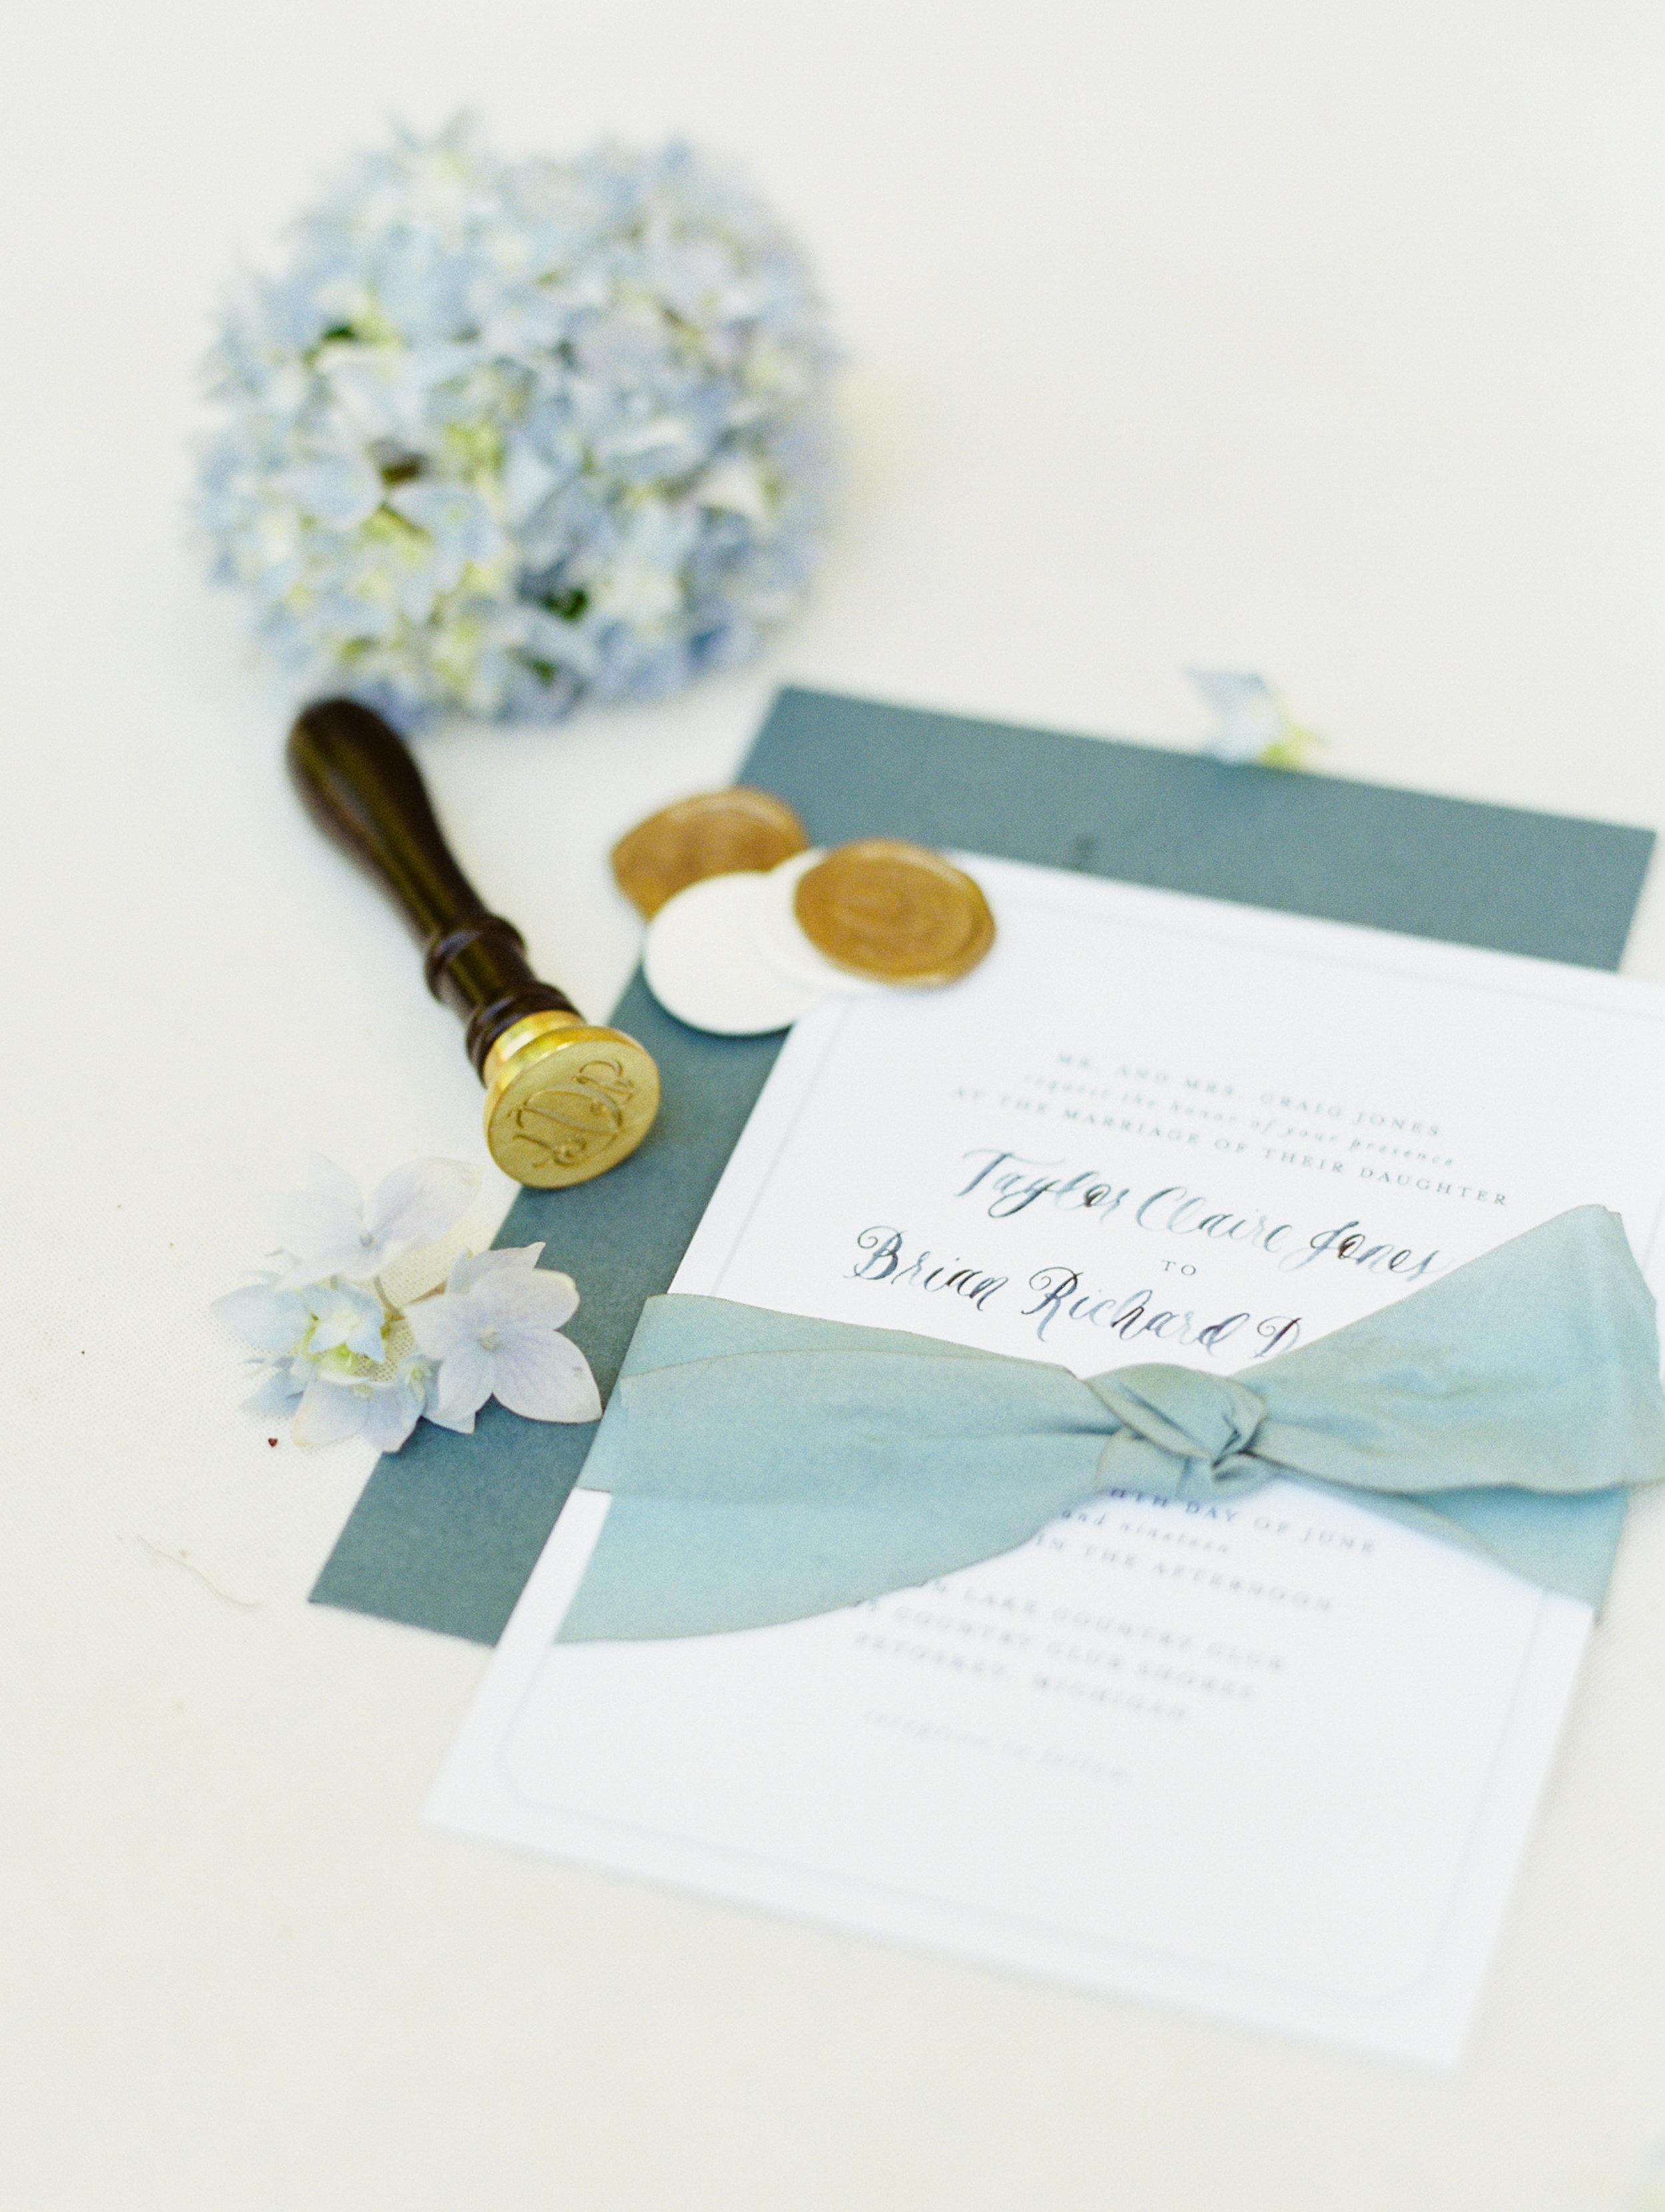 DeGuilio+Wedding+Detailsf-15 copy.jpg